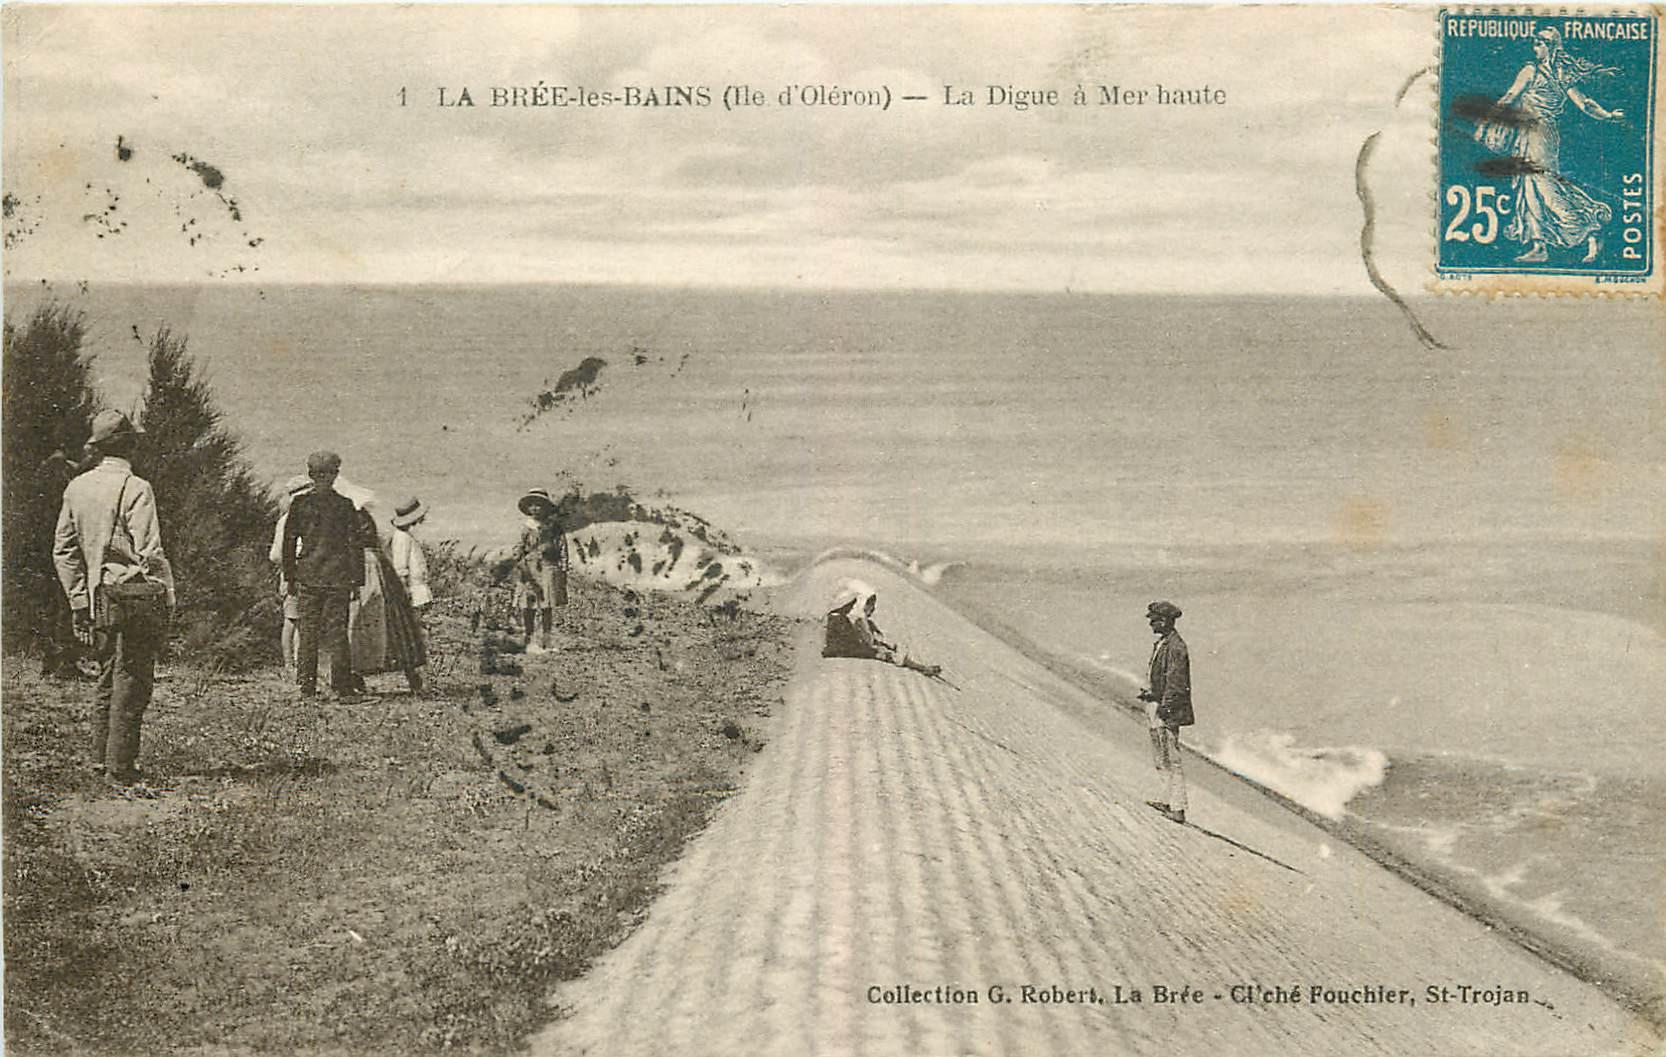 WW 17 LA BREE-LES-BAINS. La Digue à Mer haute 1920